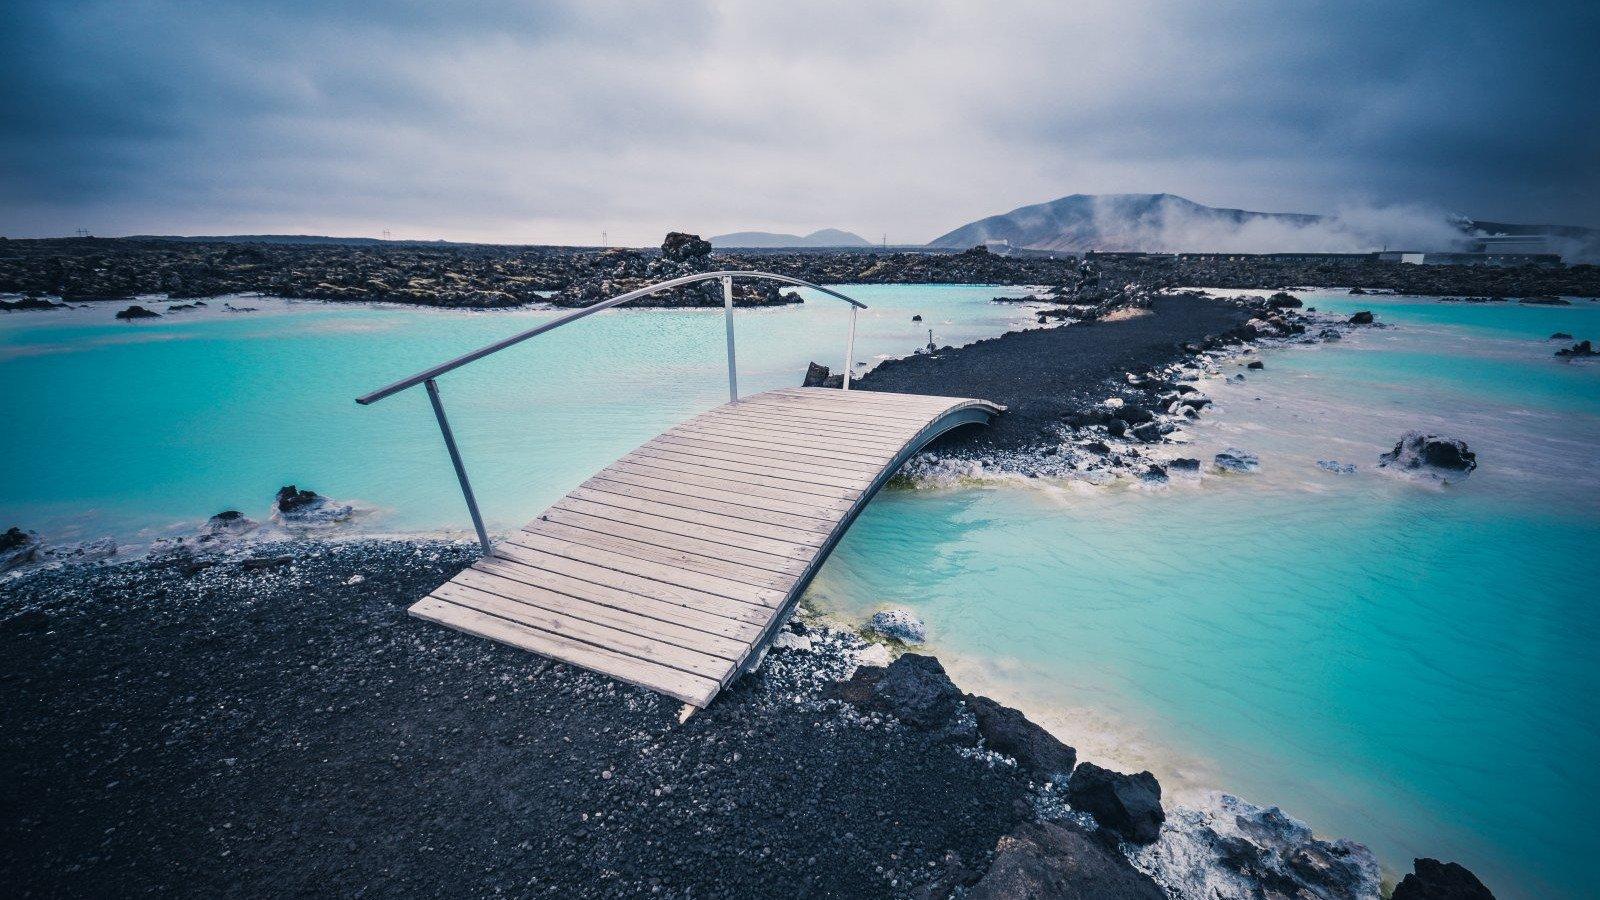 El balneario geotermal de la Laguna Azul en Islandia.